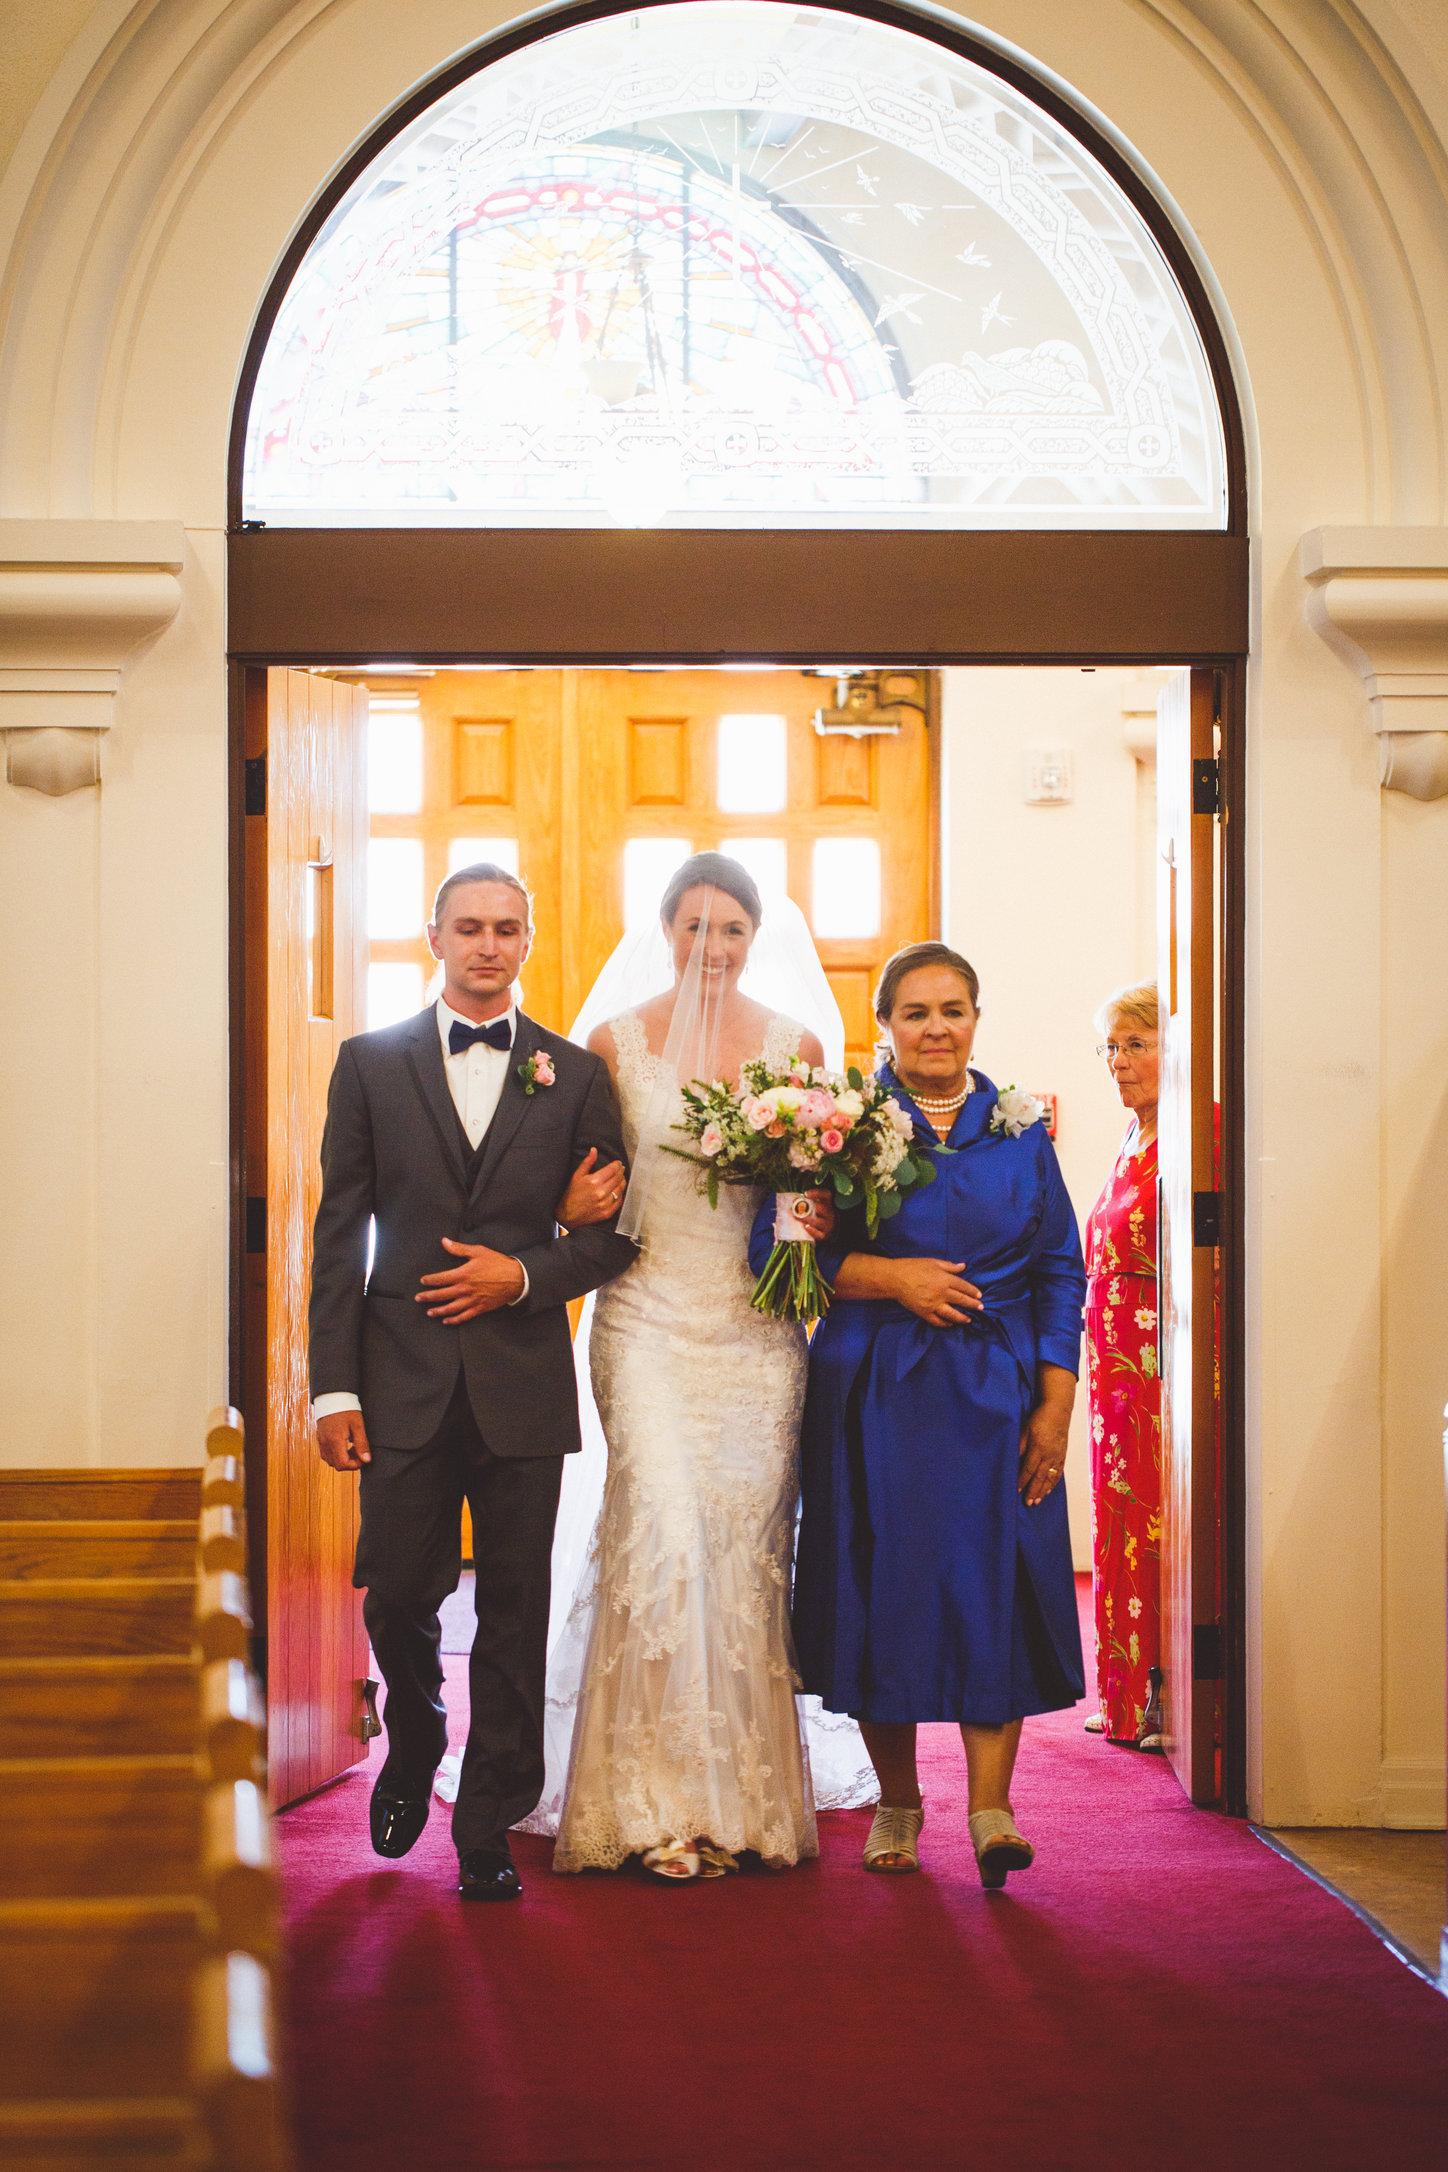 SandC-wedding-167.jpg